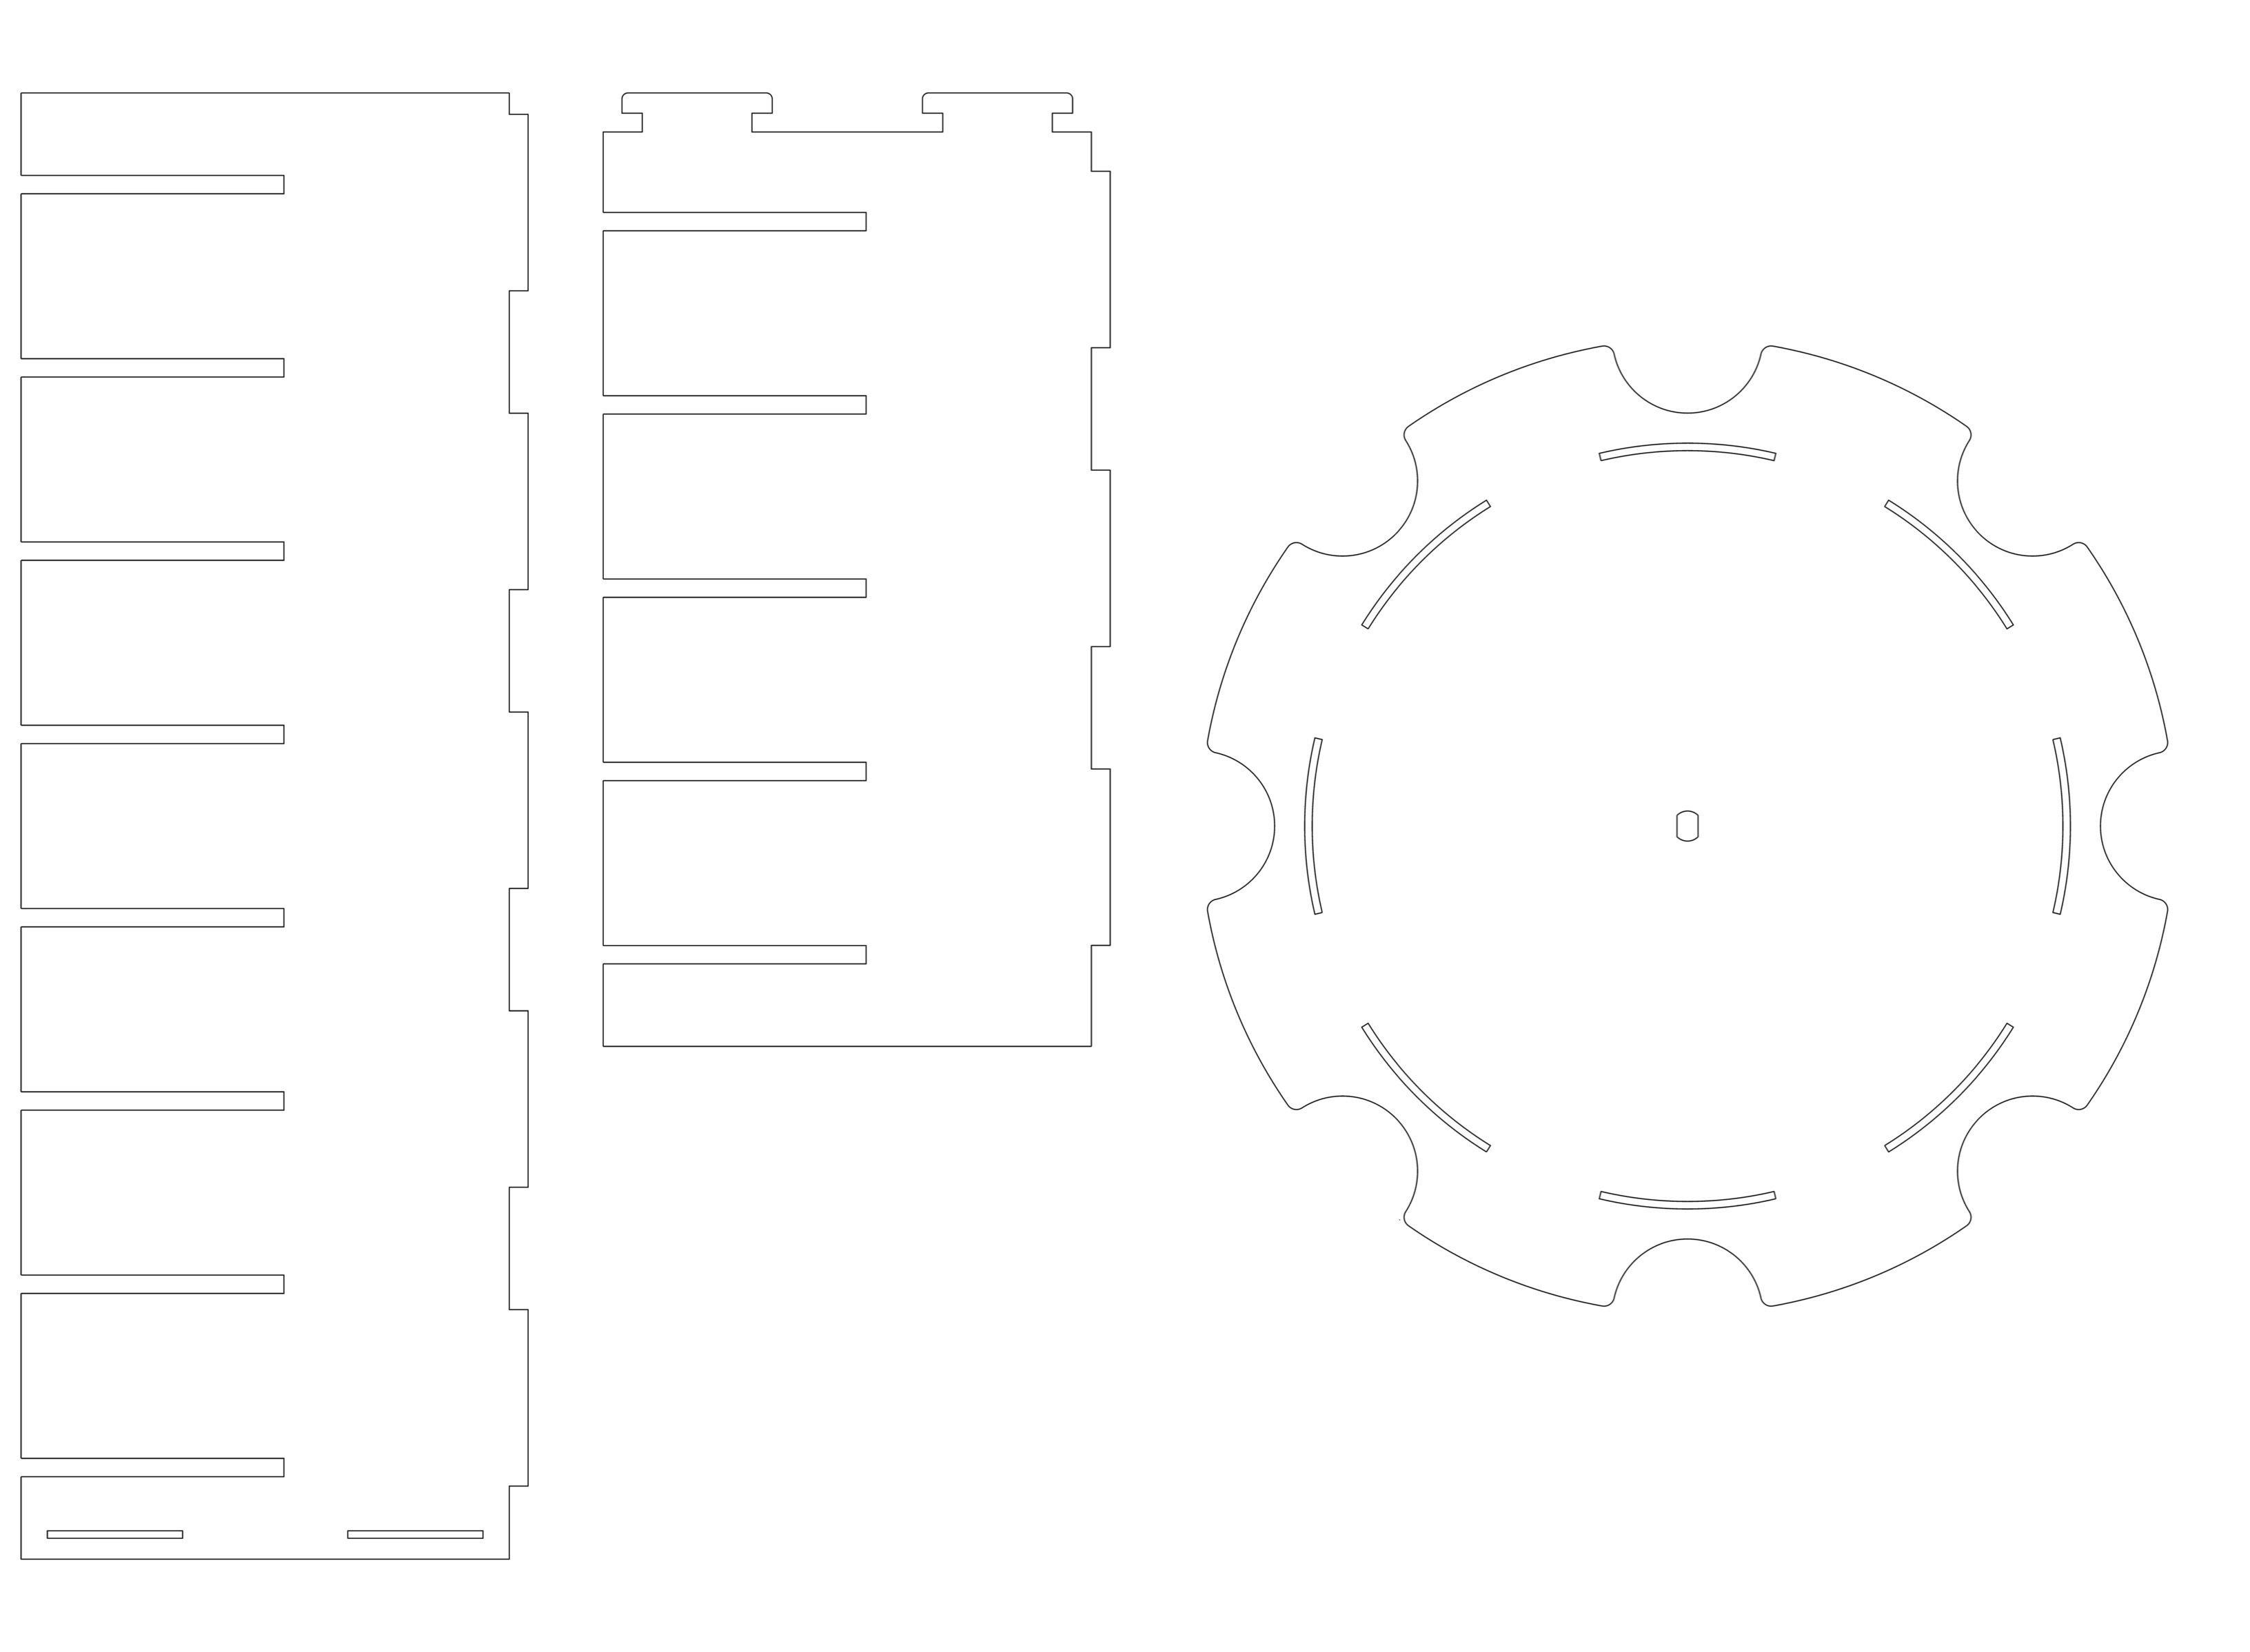 circuitpython_IMG_4797.jpg